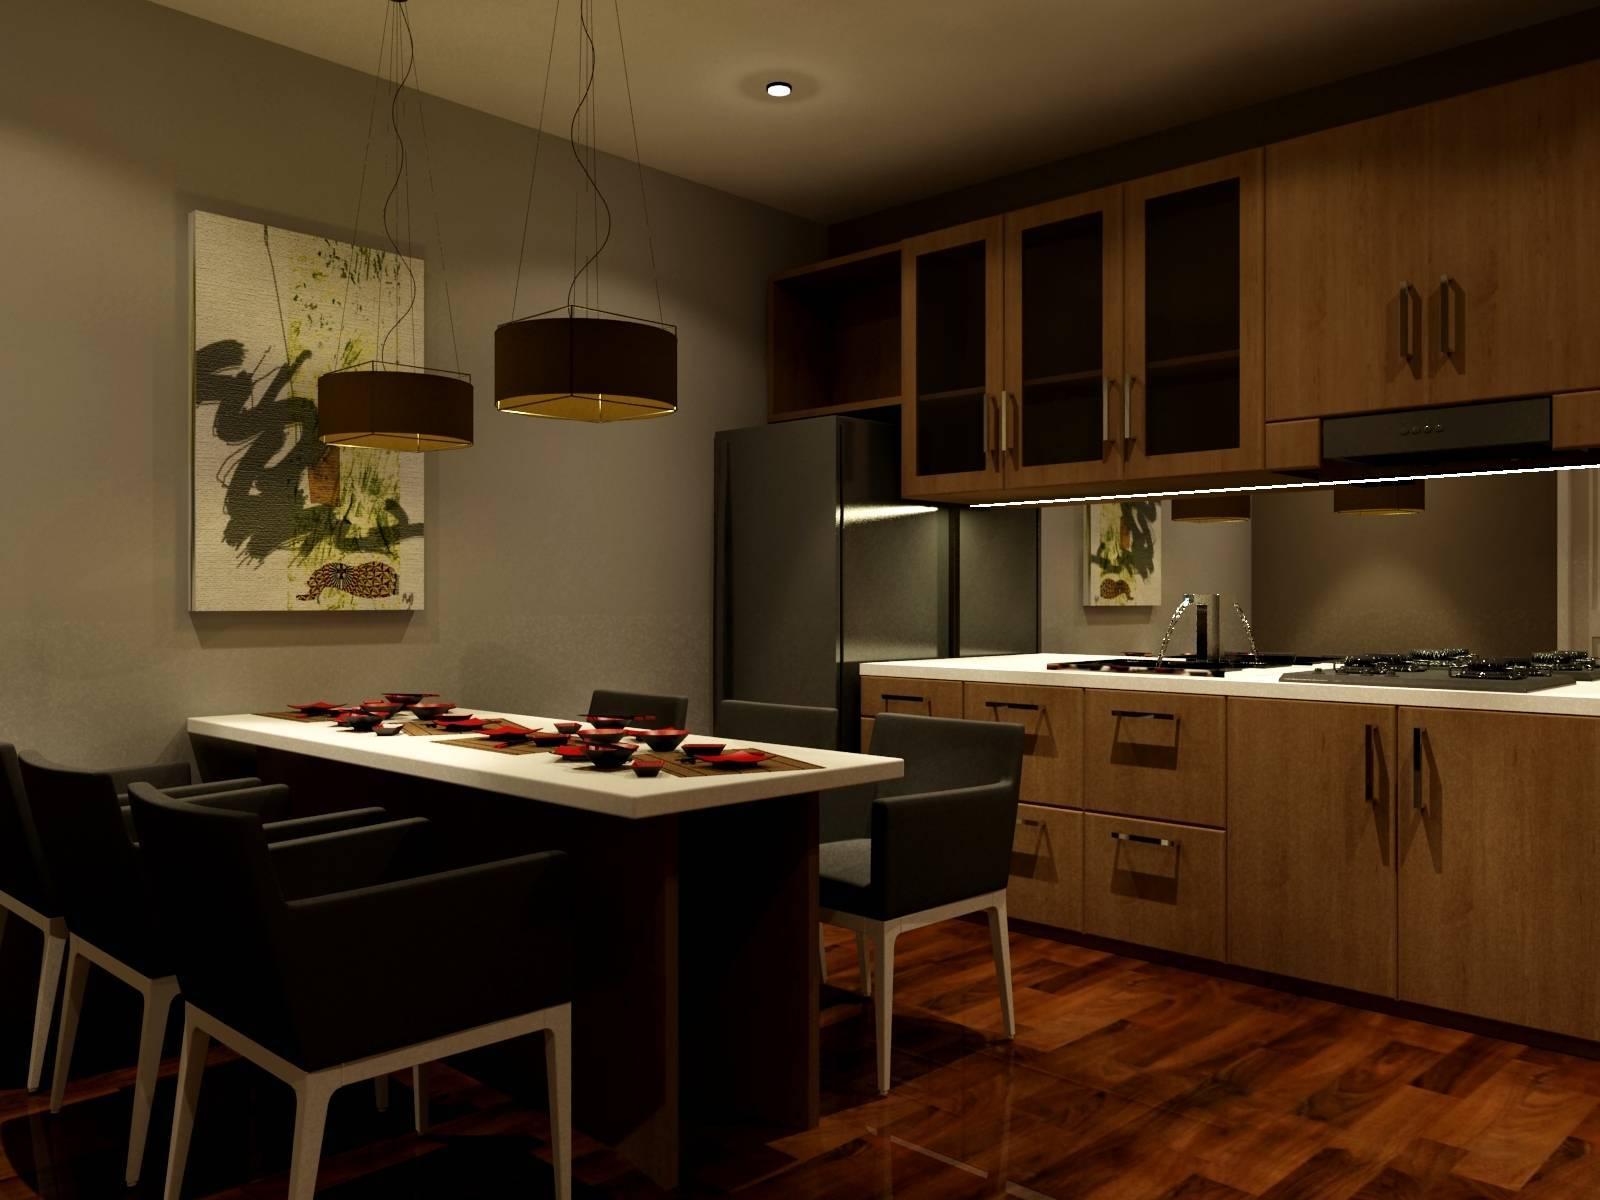 Pt Ergonomi Cipta Karya Private Residence Priuk Jaya Priuk Jaya Priuk Jaya Dining Room   7453